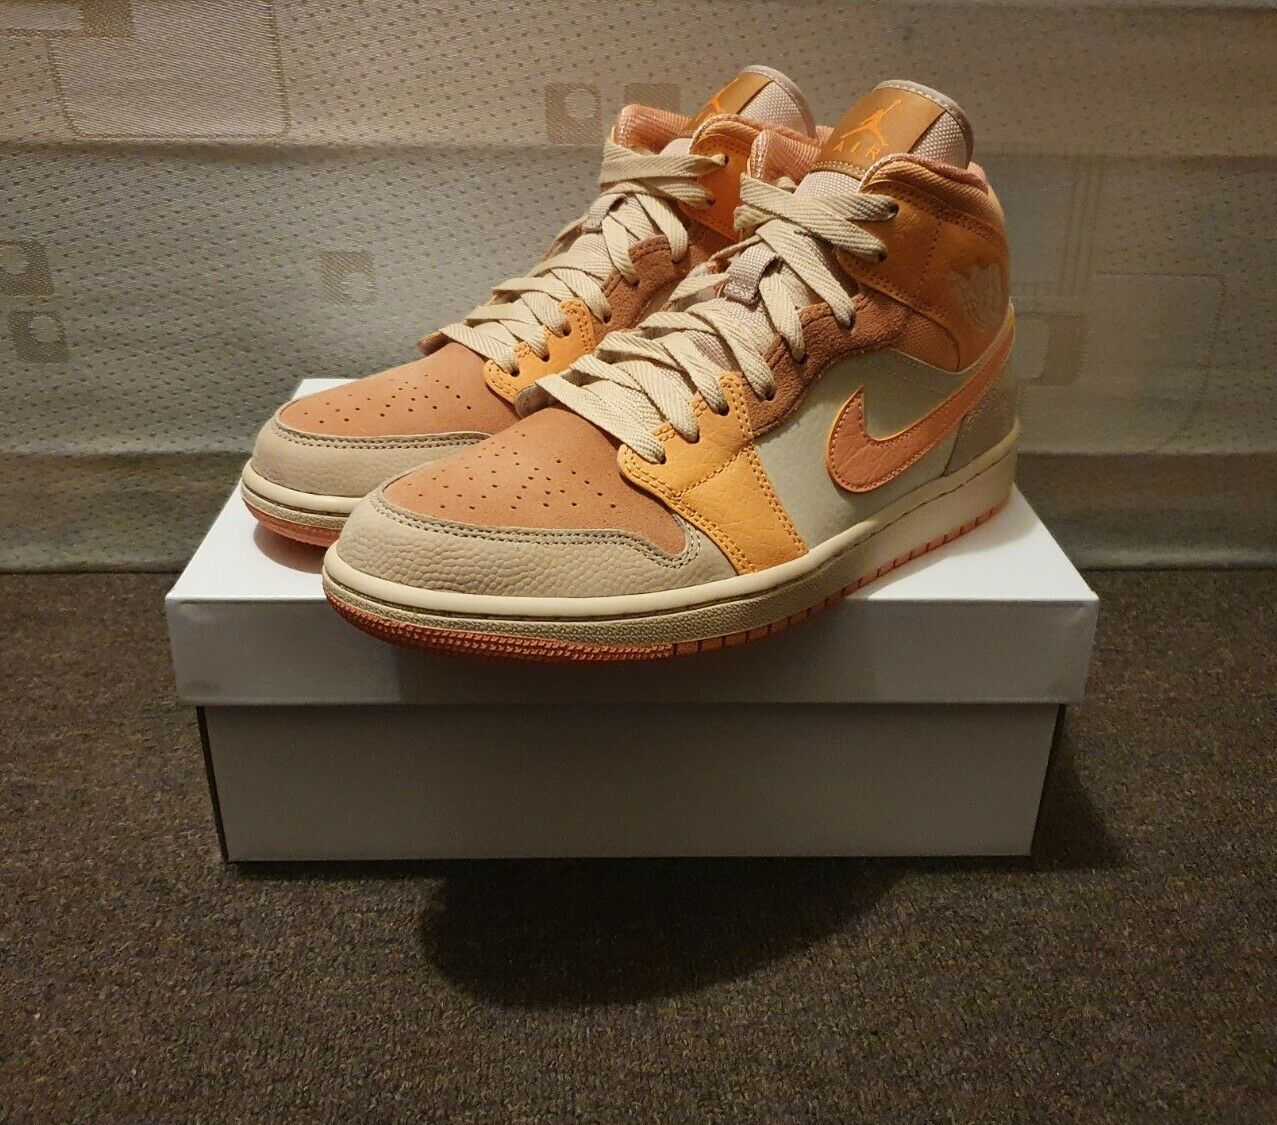 Nike Air Jordan 1 Mid Apricot/Atomic Orange UK 5.5/ US 8 (w) *In Hand* ✅